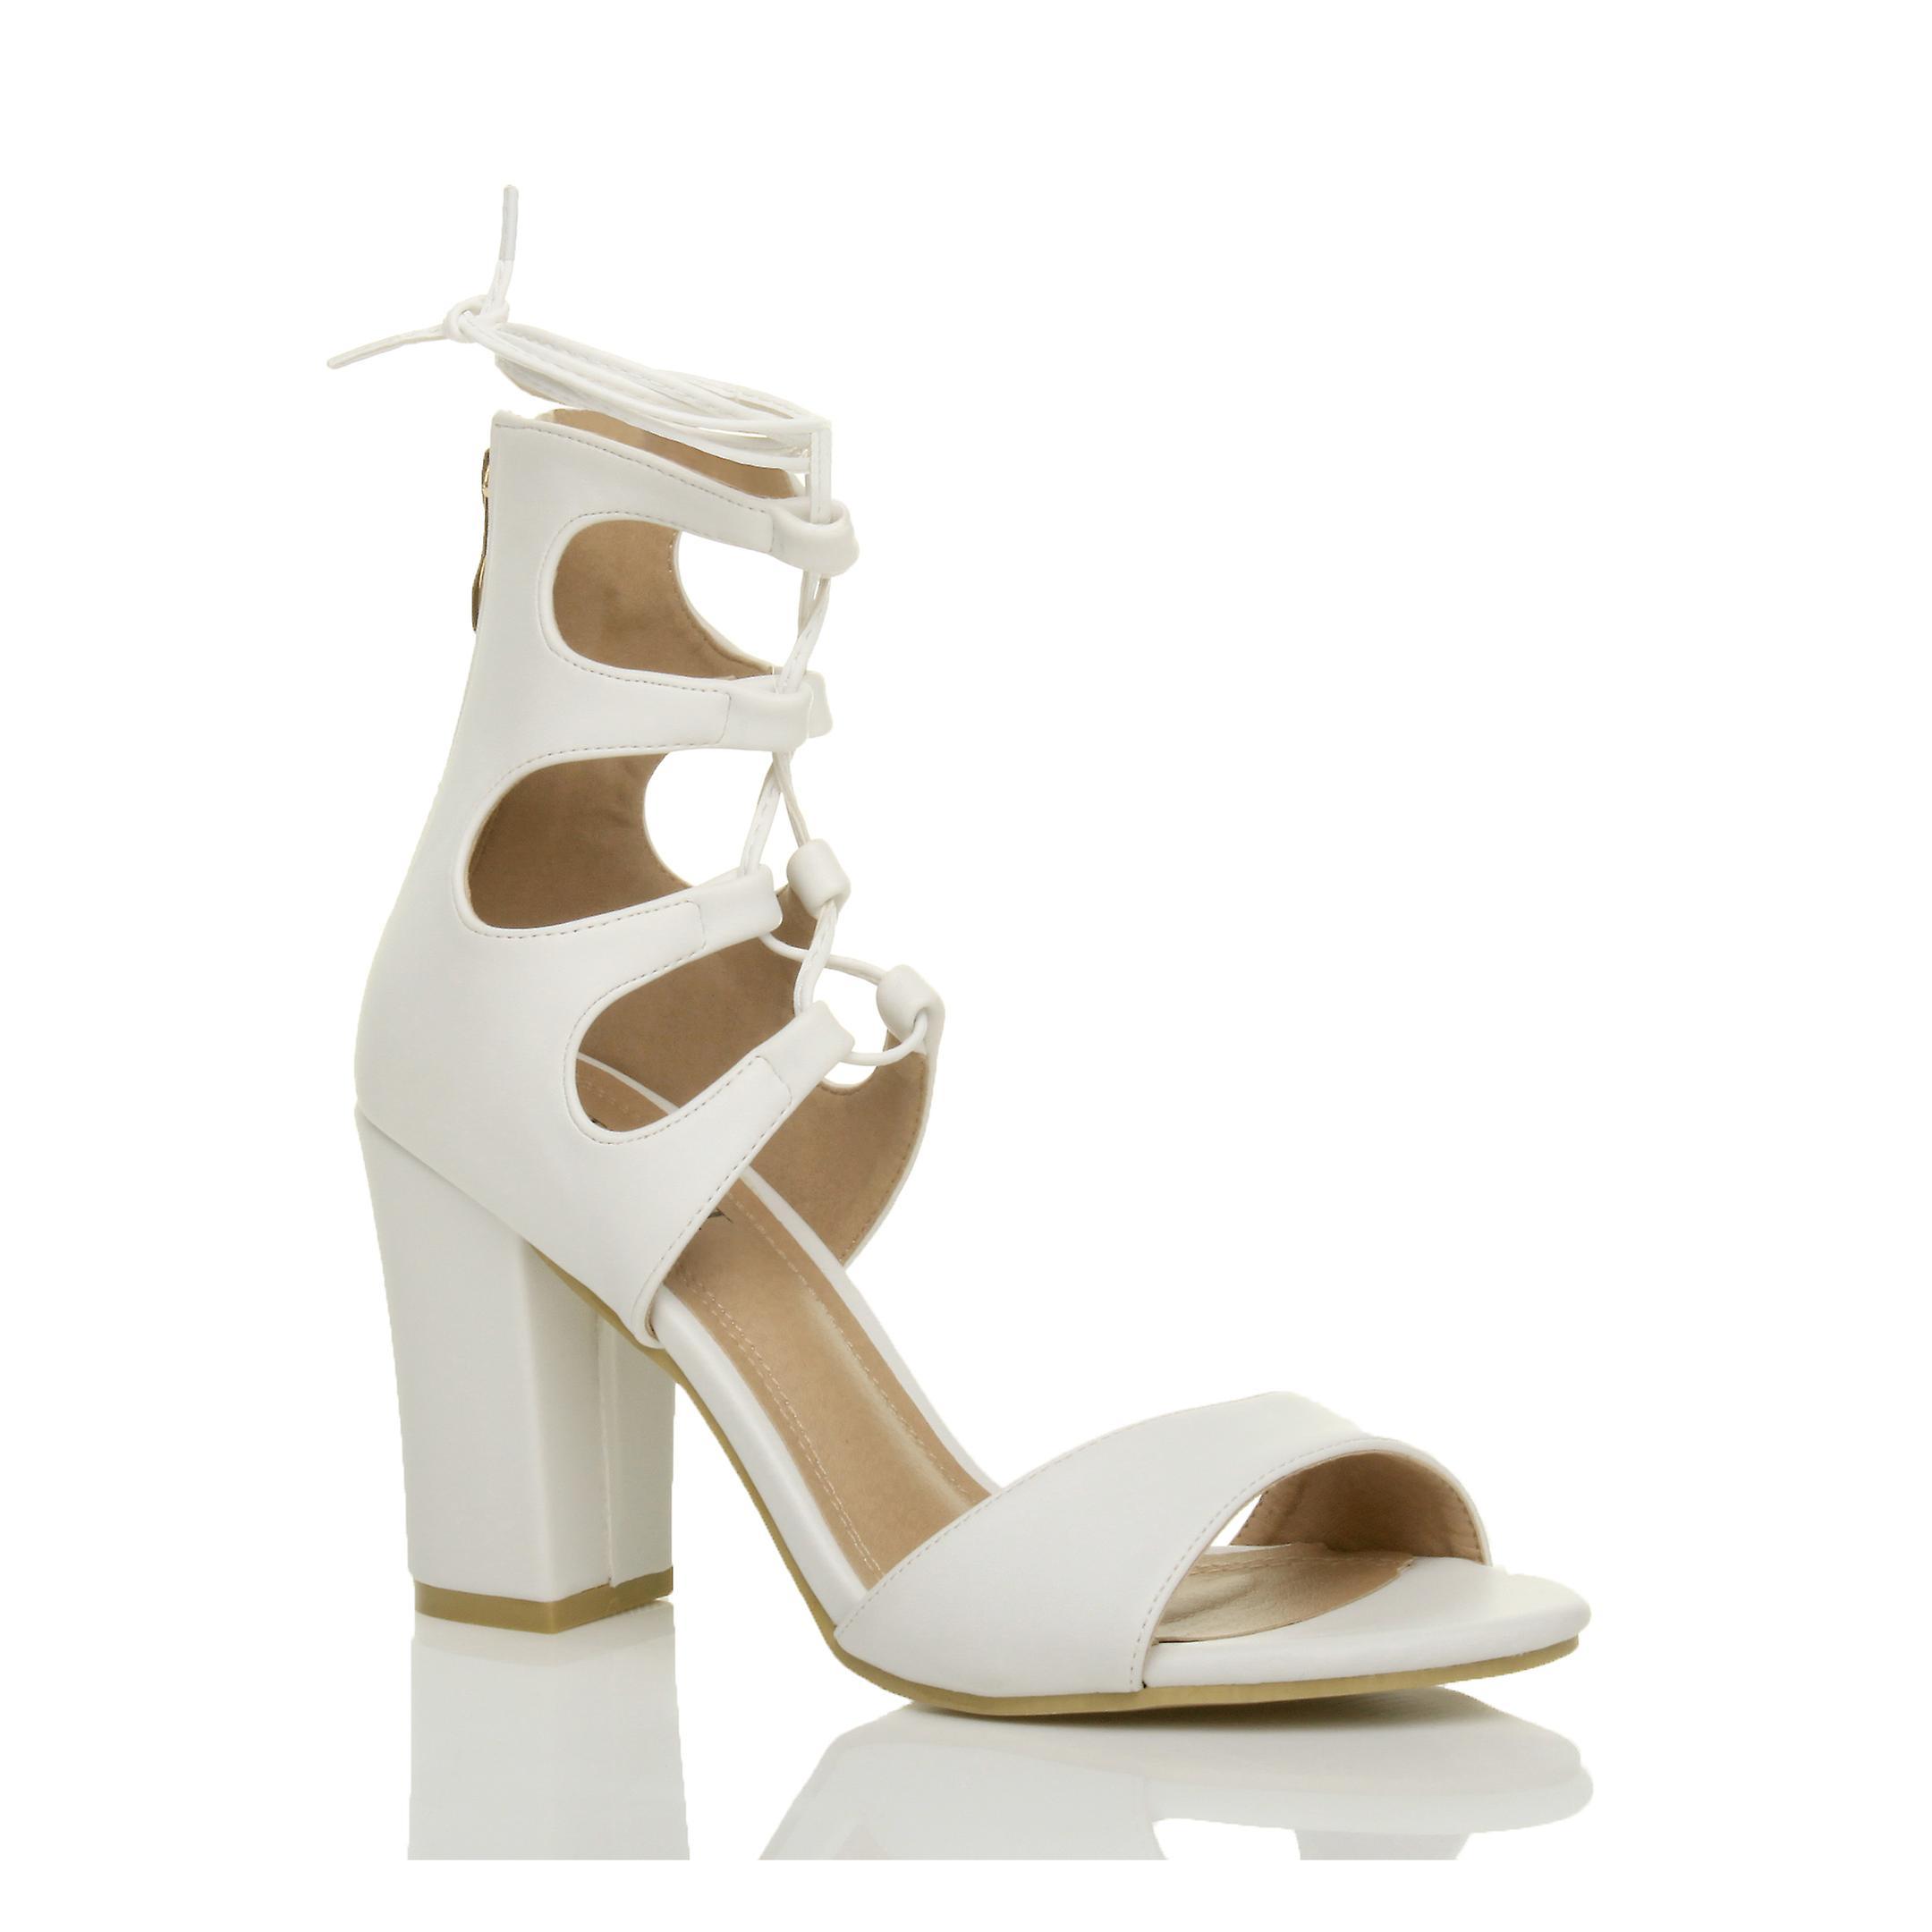 blokke sko ud